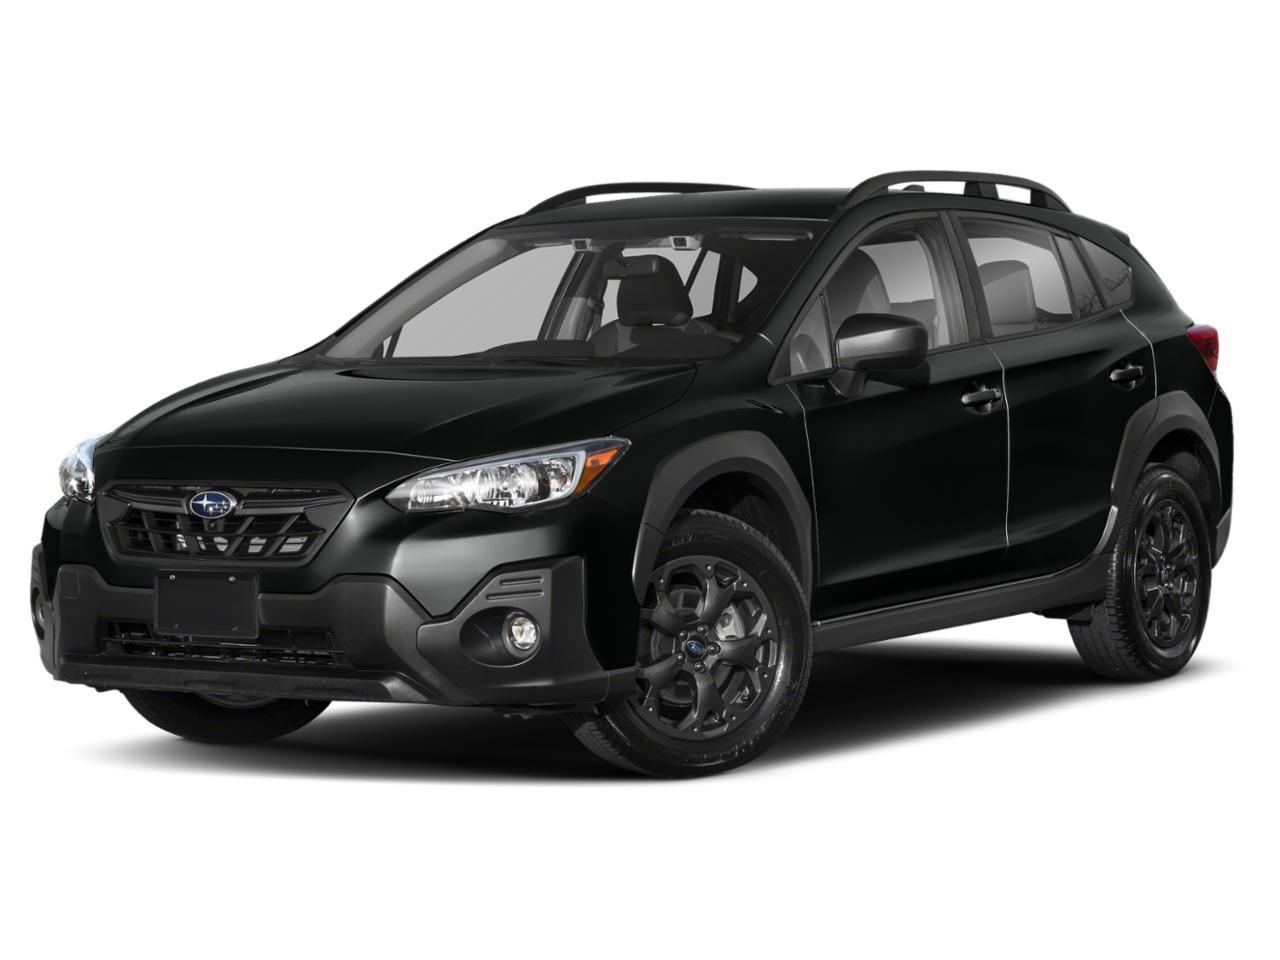 2021 Subaru Crosstrek Vehicle Photo in Dallas, TX 75209